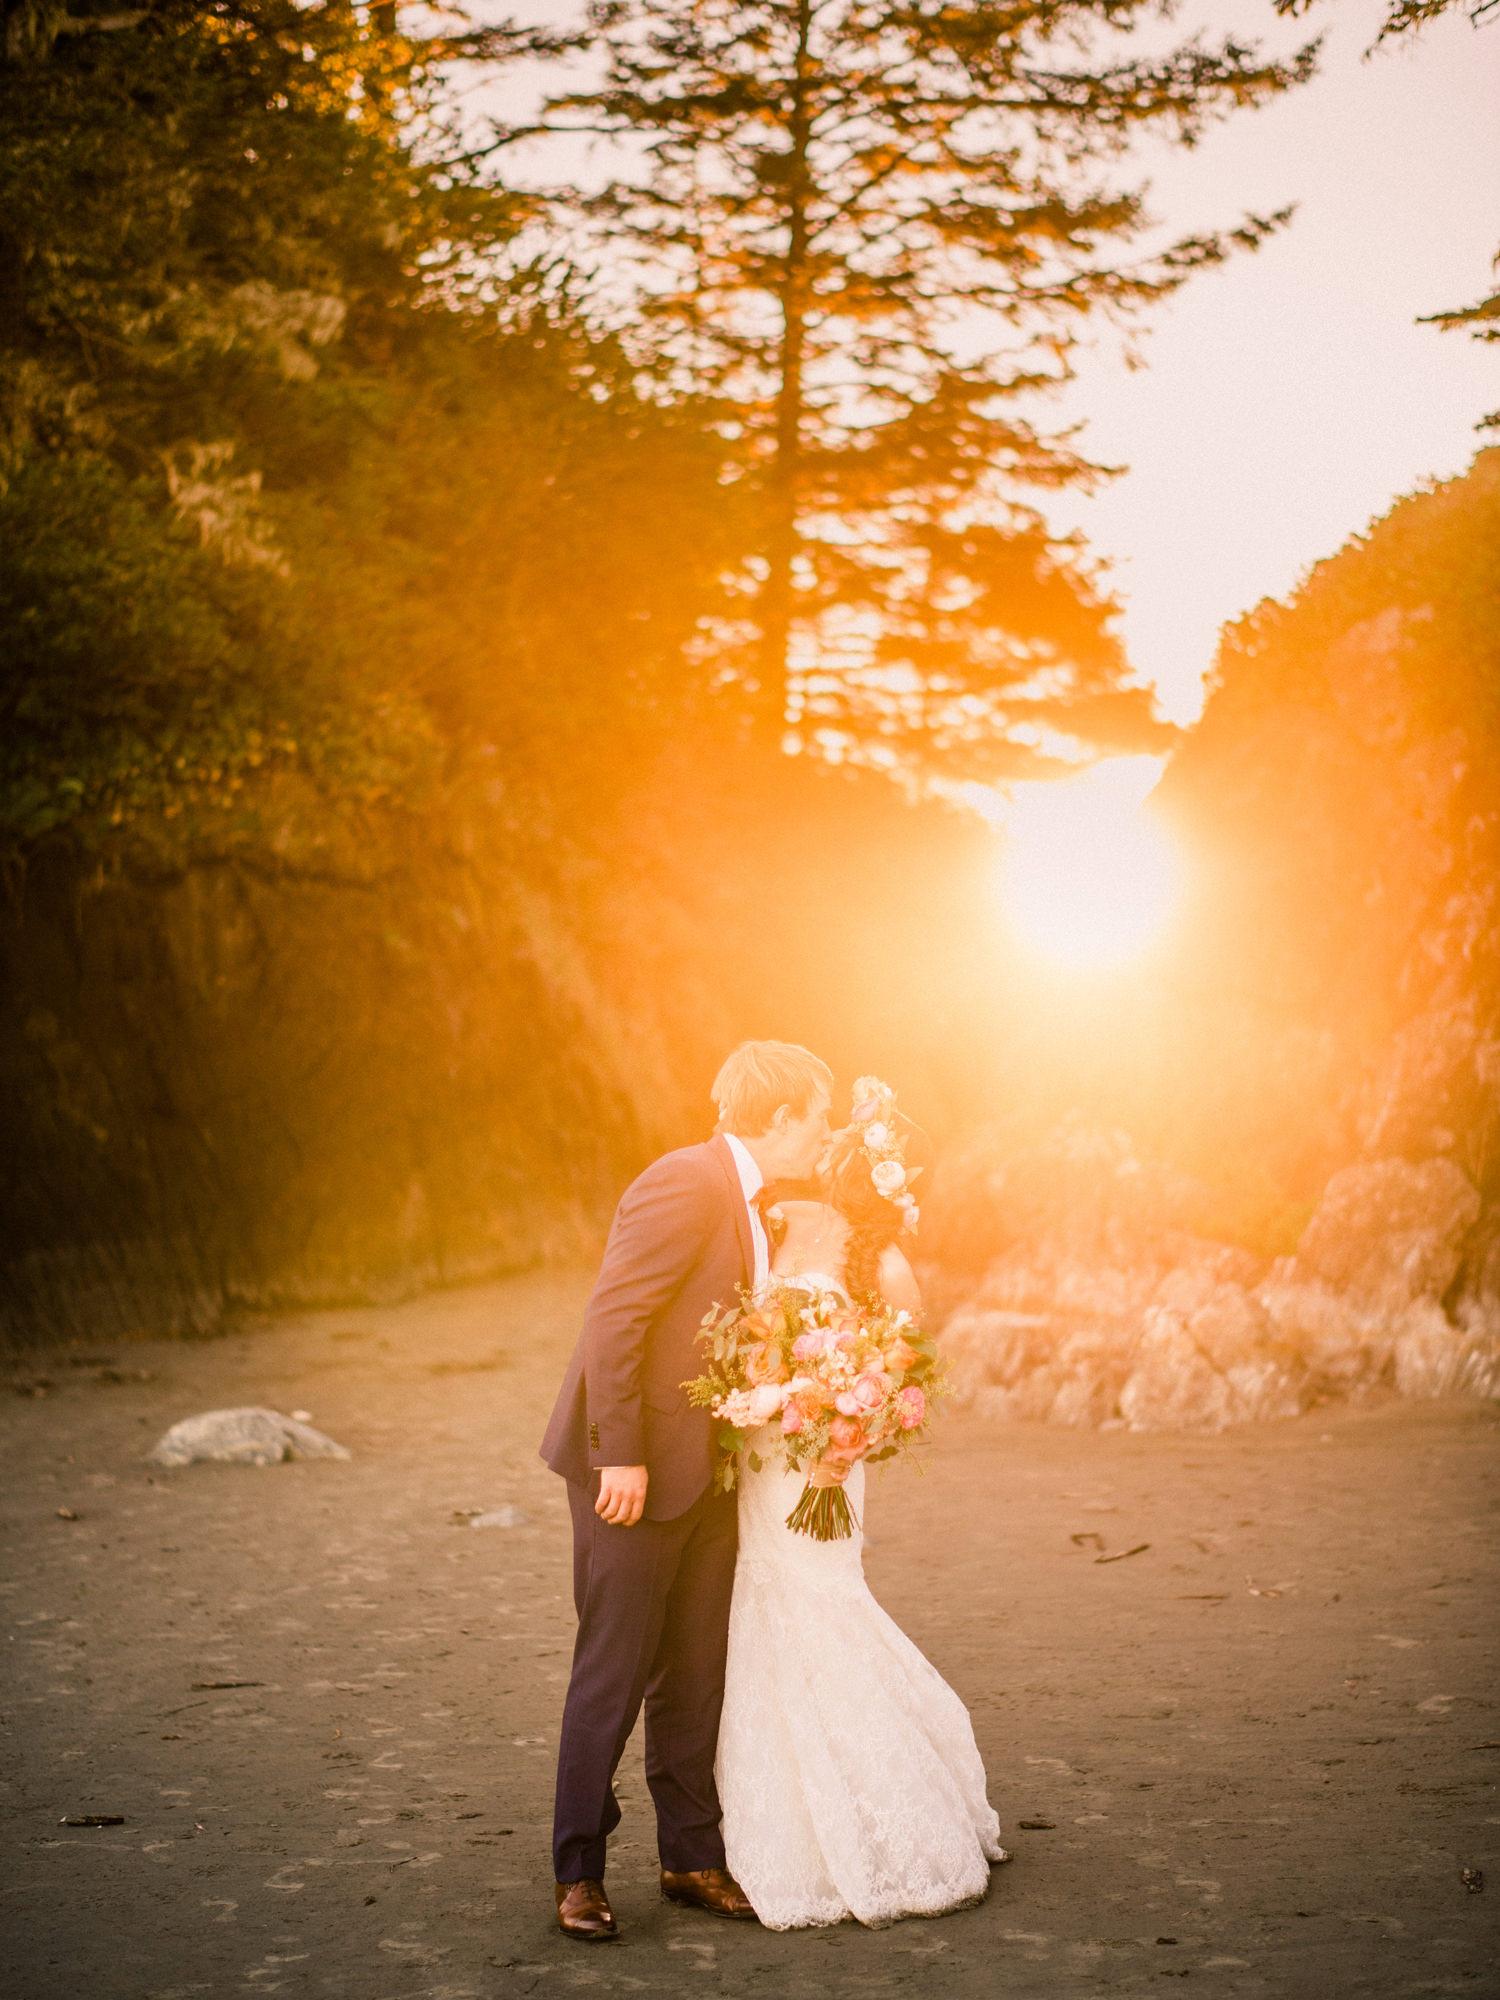 wickaninnish-inn-tofino-bc-elopement-ryan-flynn-photography-00078.JPG